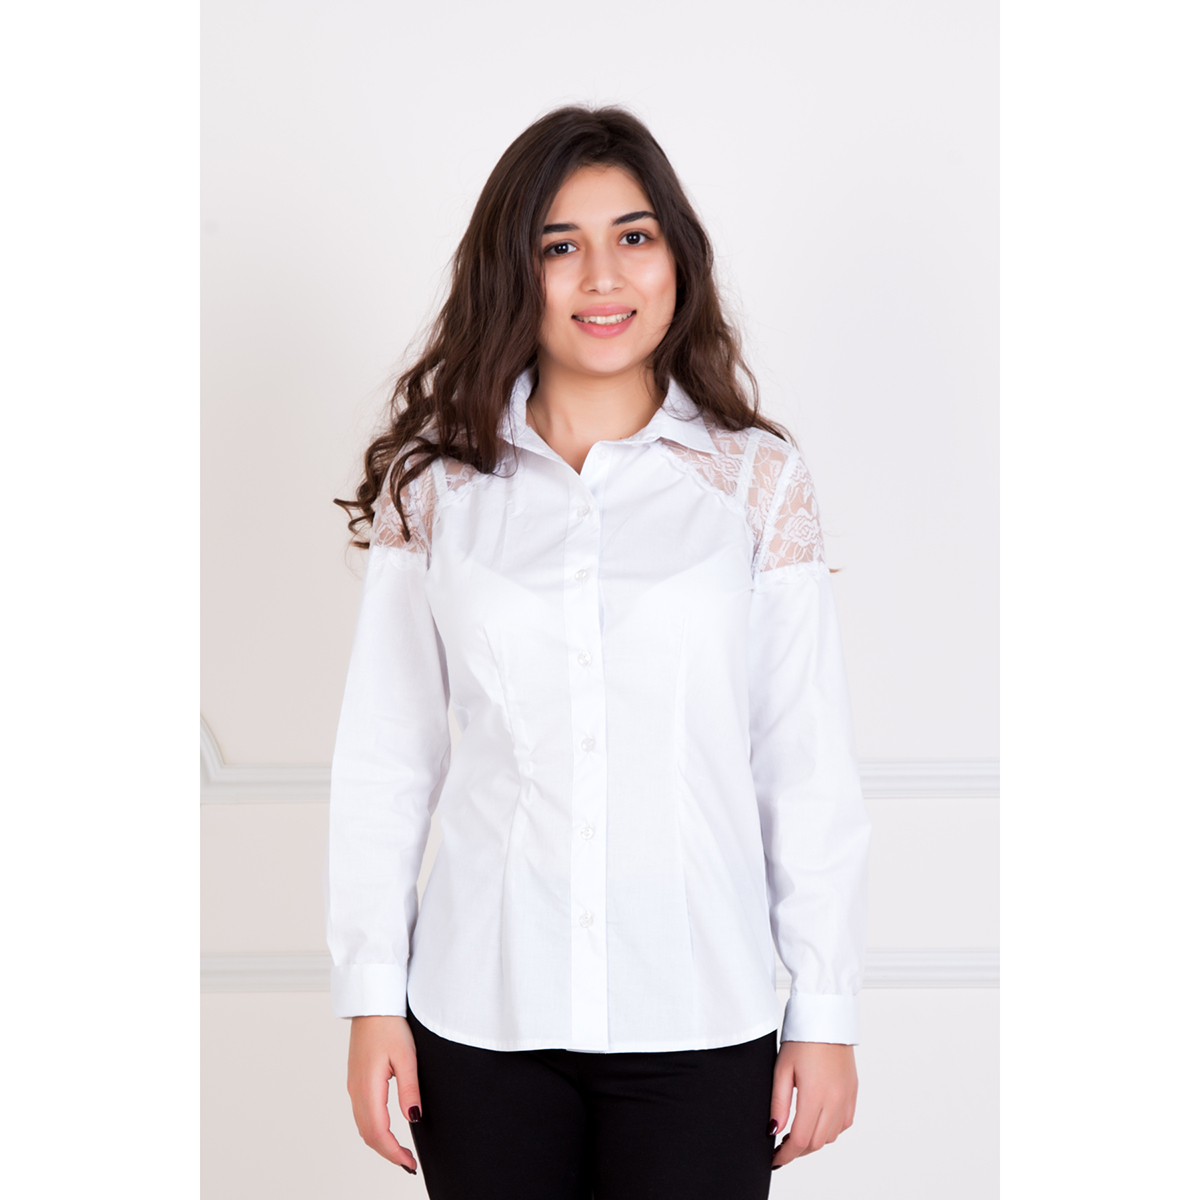 Женская рубашка Янь, размер 44Блузки, майки, кофты<br>Обхват груди:88 см<br>Обхват талии:68 см<br>Обхват бедер:96 см<br>Рост:167 см<br><br>Тип: Жен. рубашка<br>Размер: 44<br>Материал: Хлопок